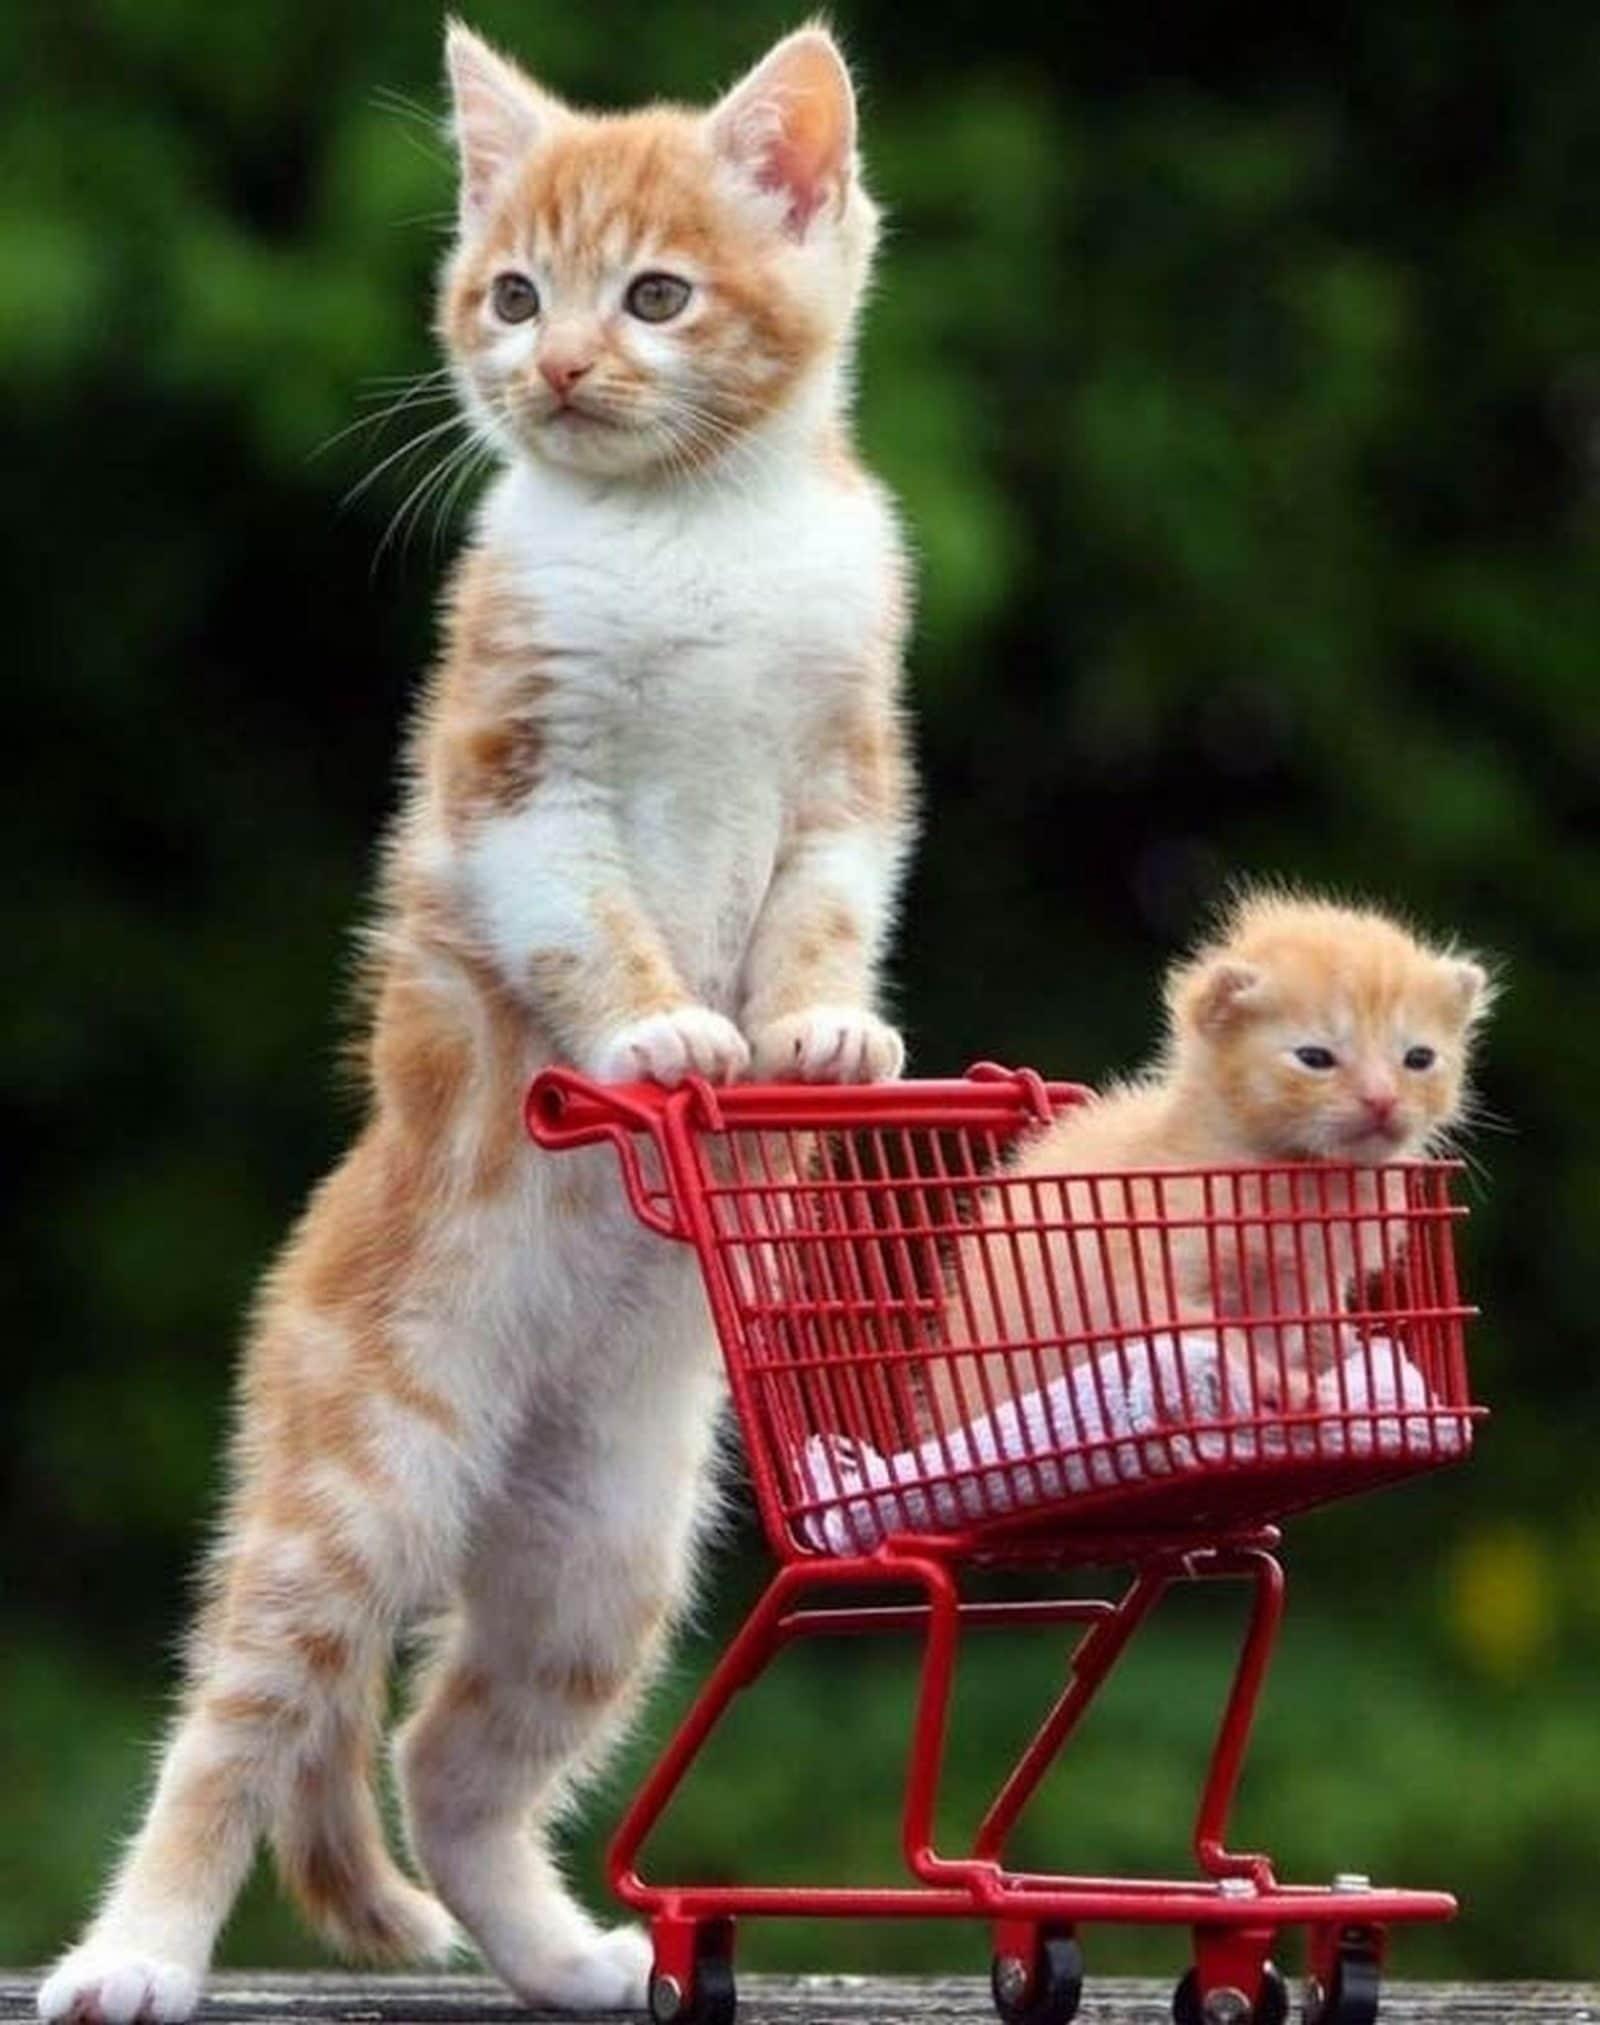 кошка везет котенка в тележке